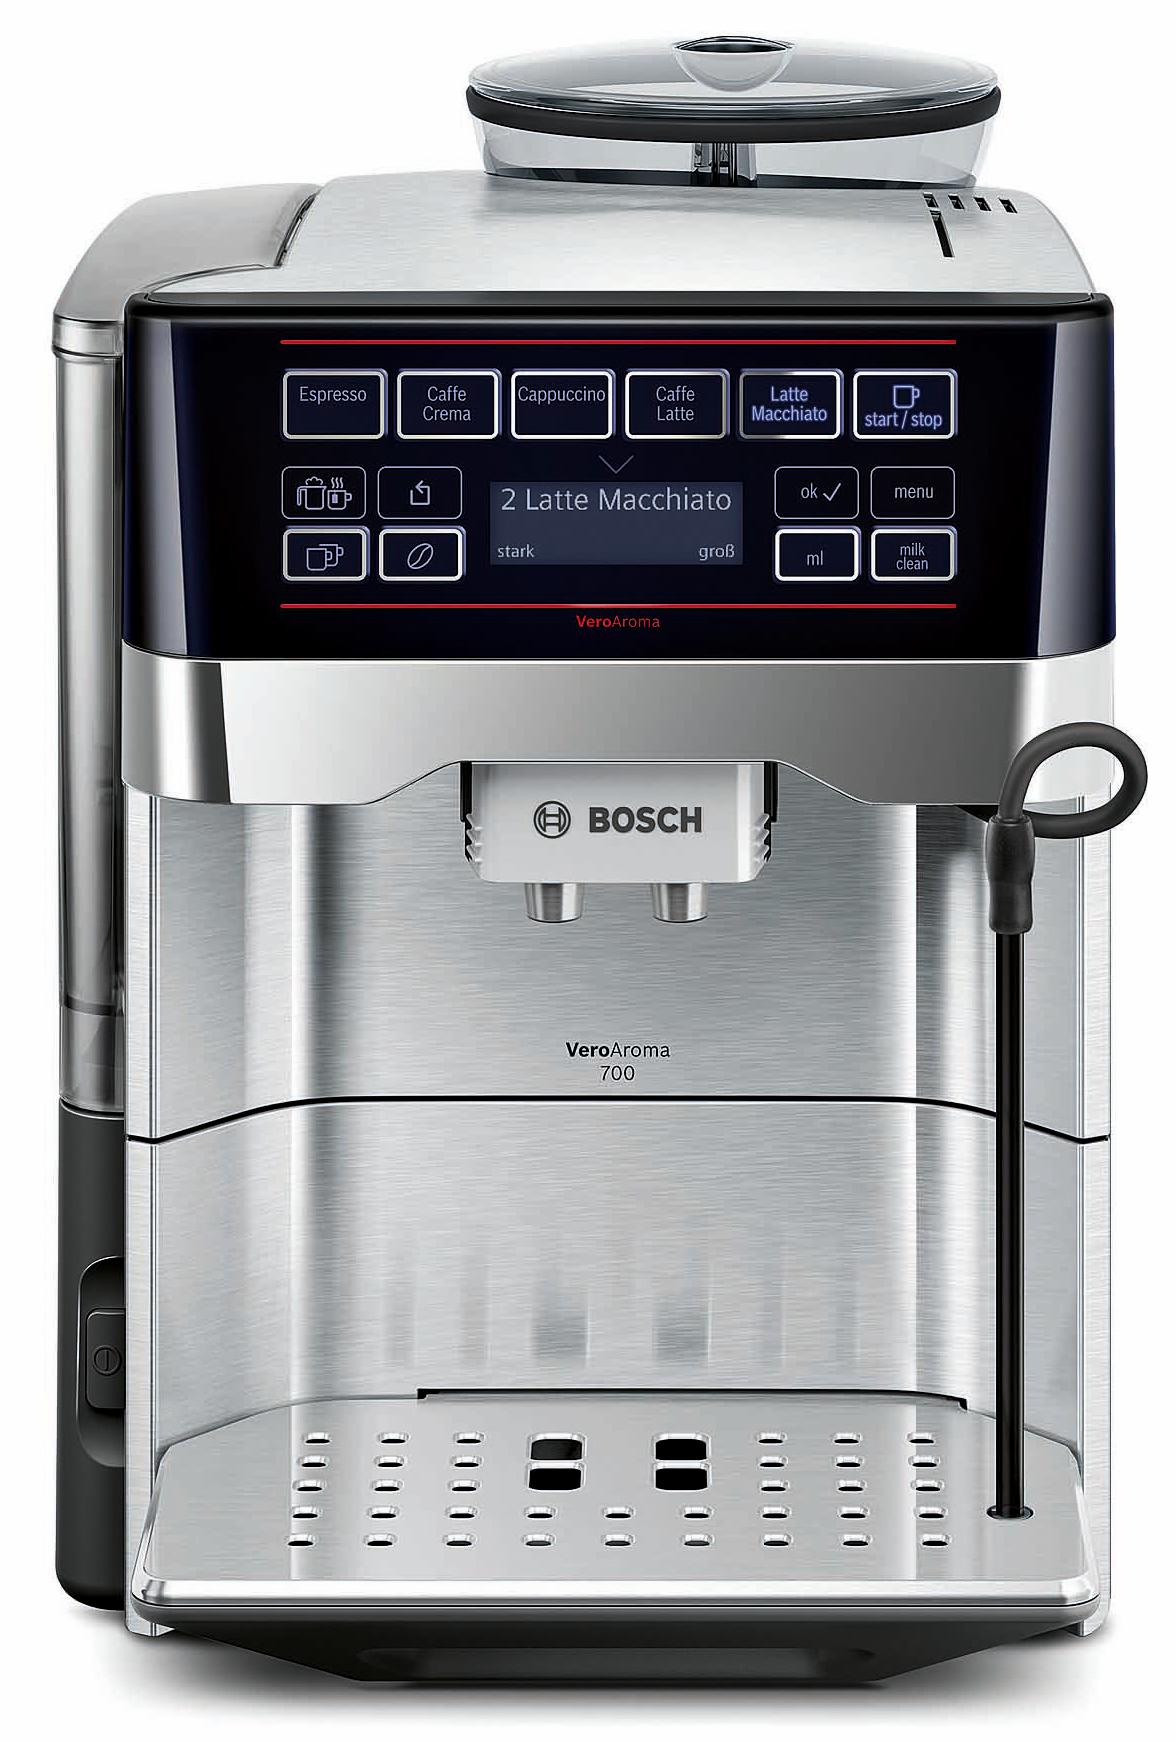 bosch kaffeevollautomat veroaroma 2 modellvarianten one touch bedienung keramik mahlwerk. Black Bedroom Furniture Sets. Home Design Ideas